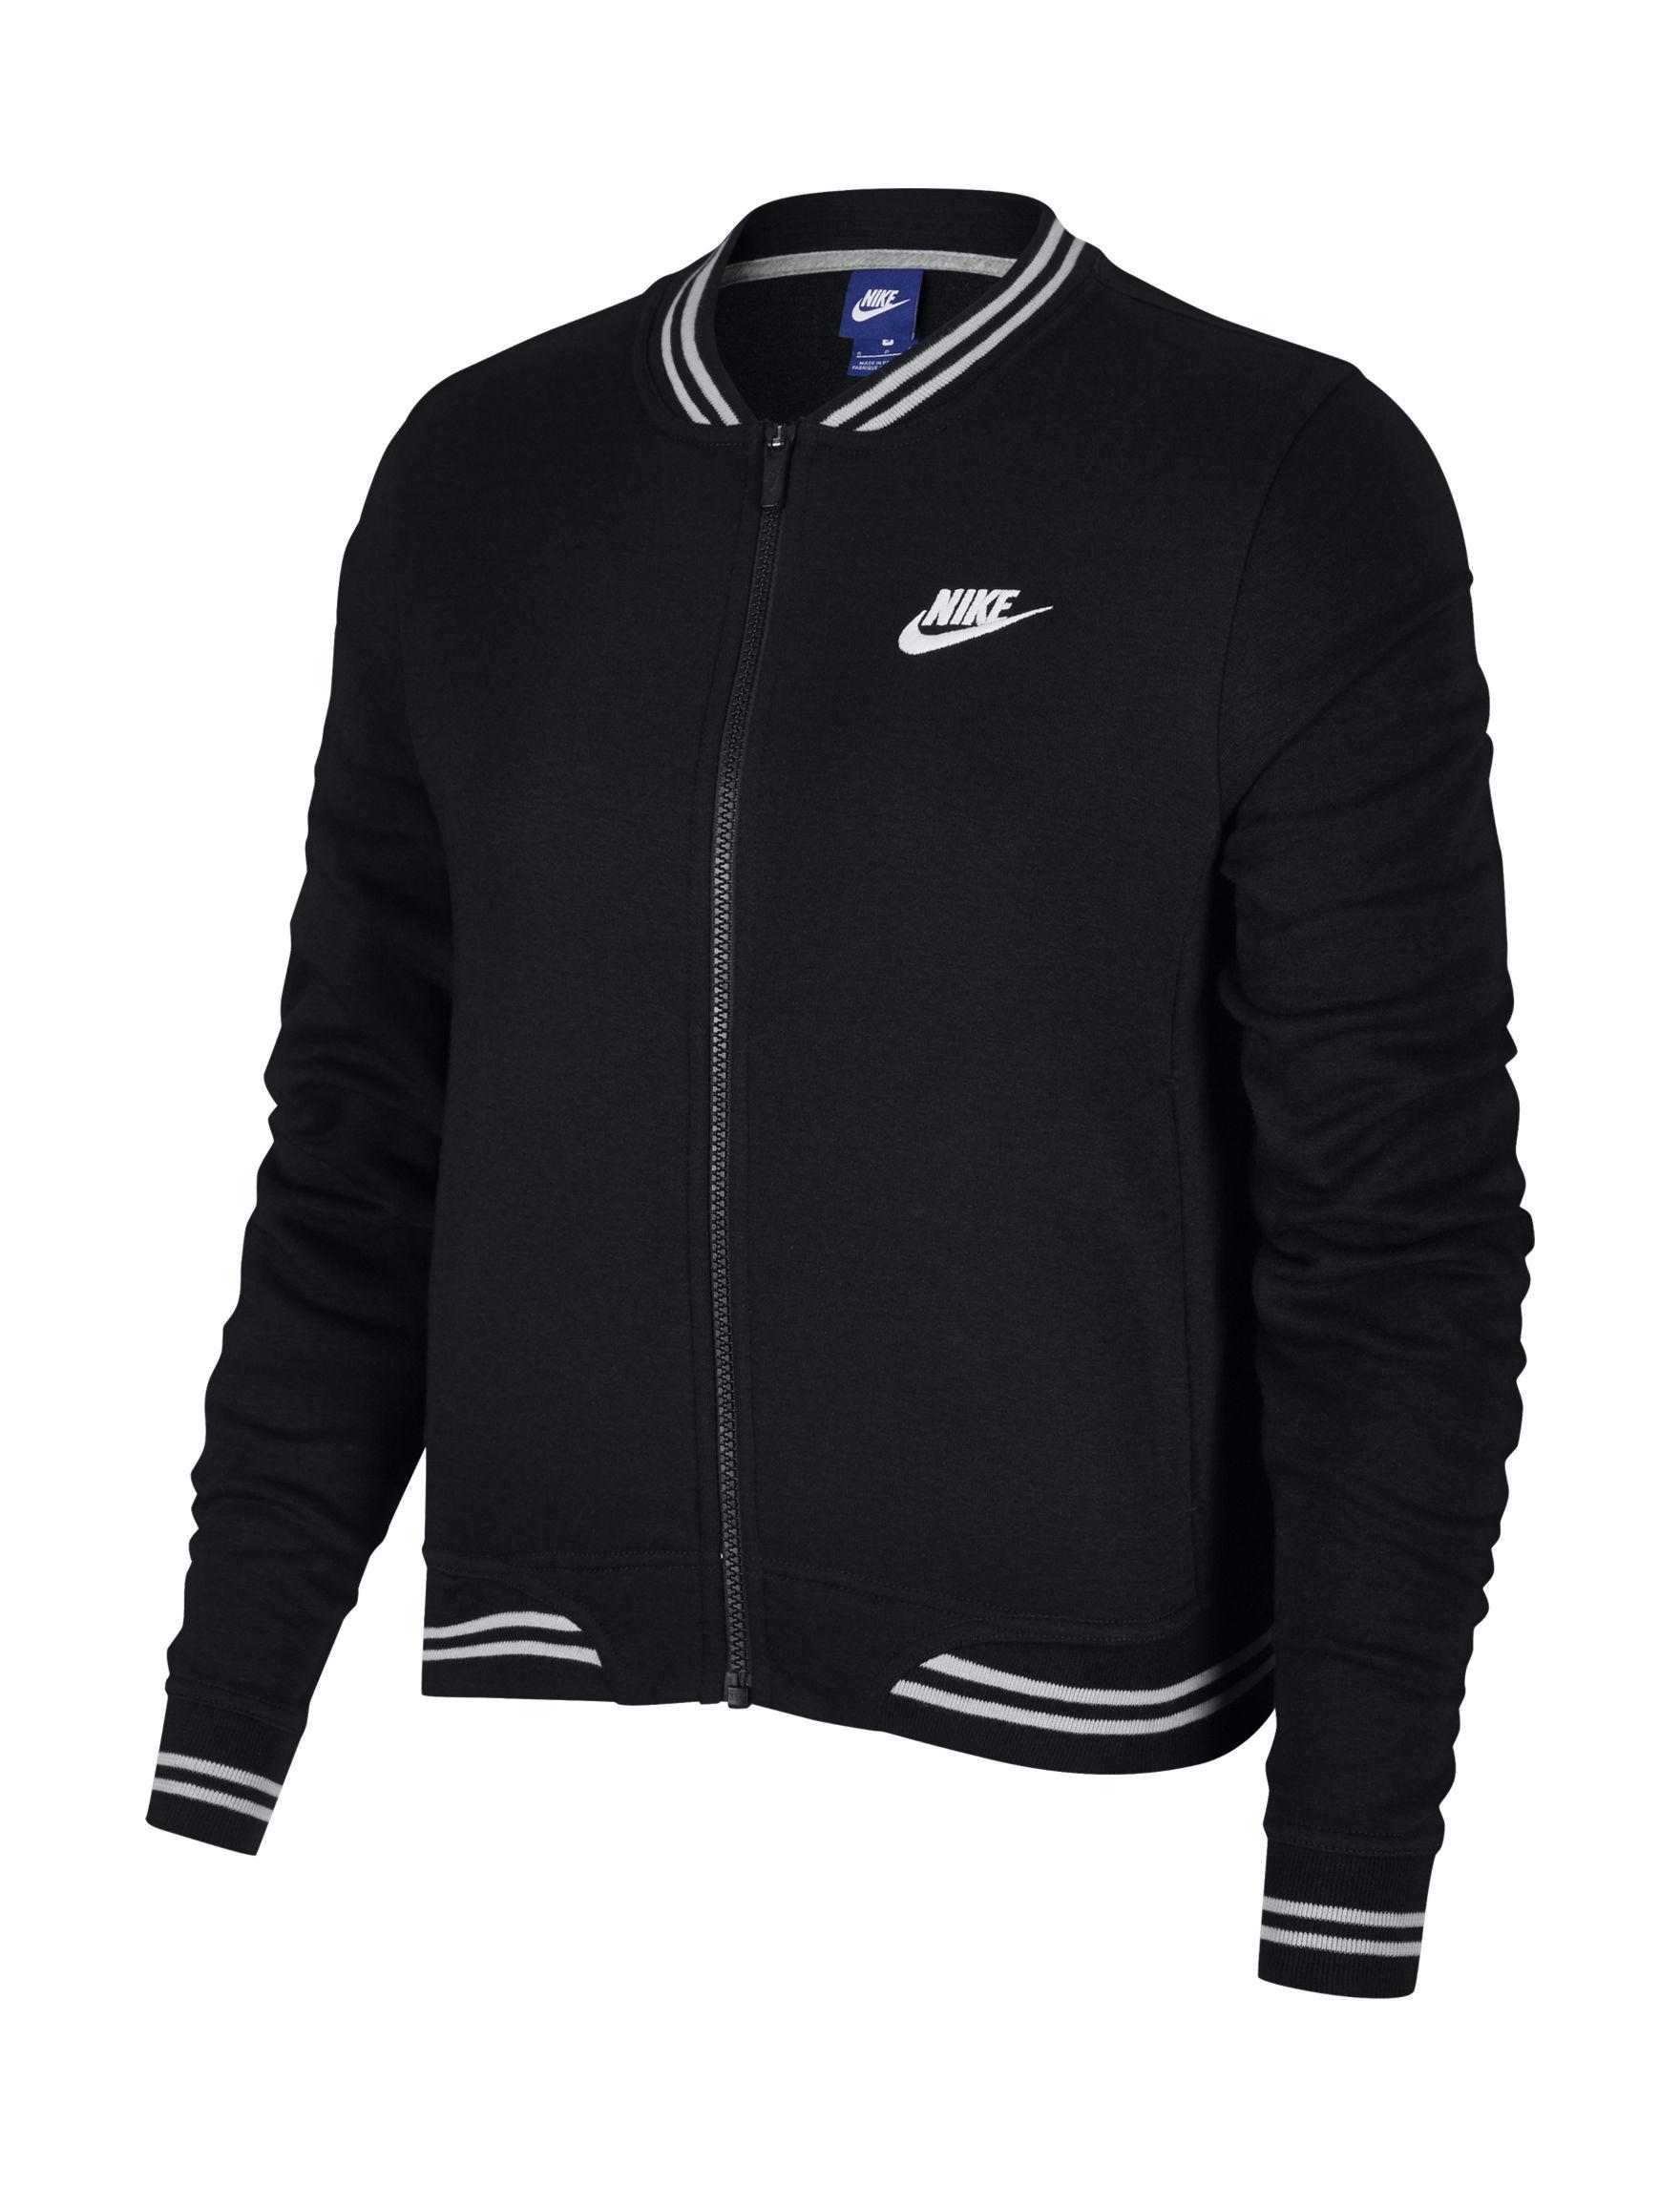 Nike Black /  White Lightweight Jackets & Blazers